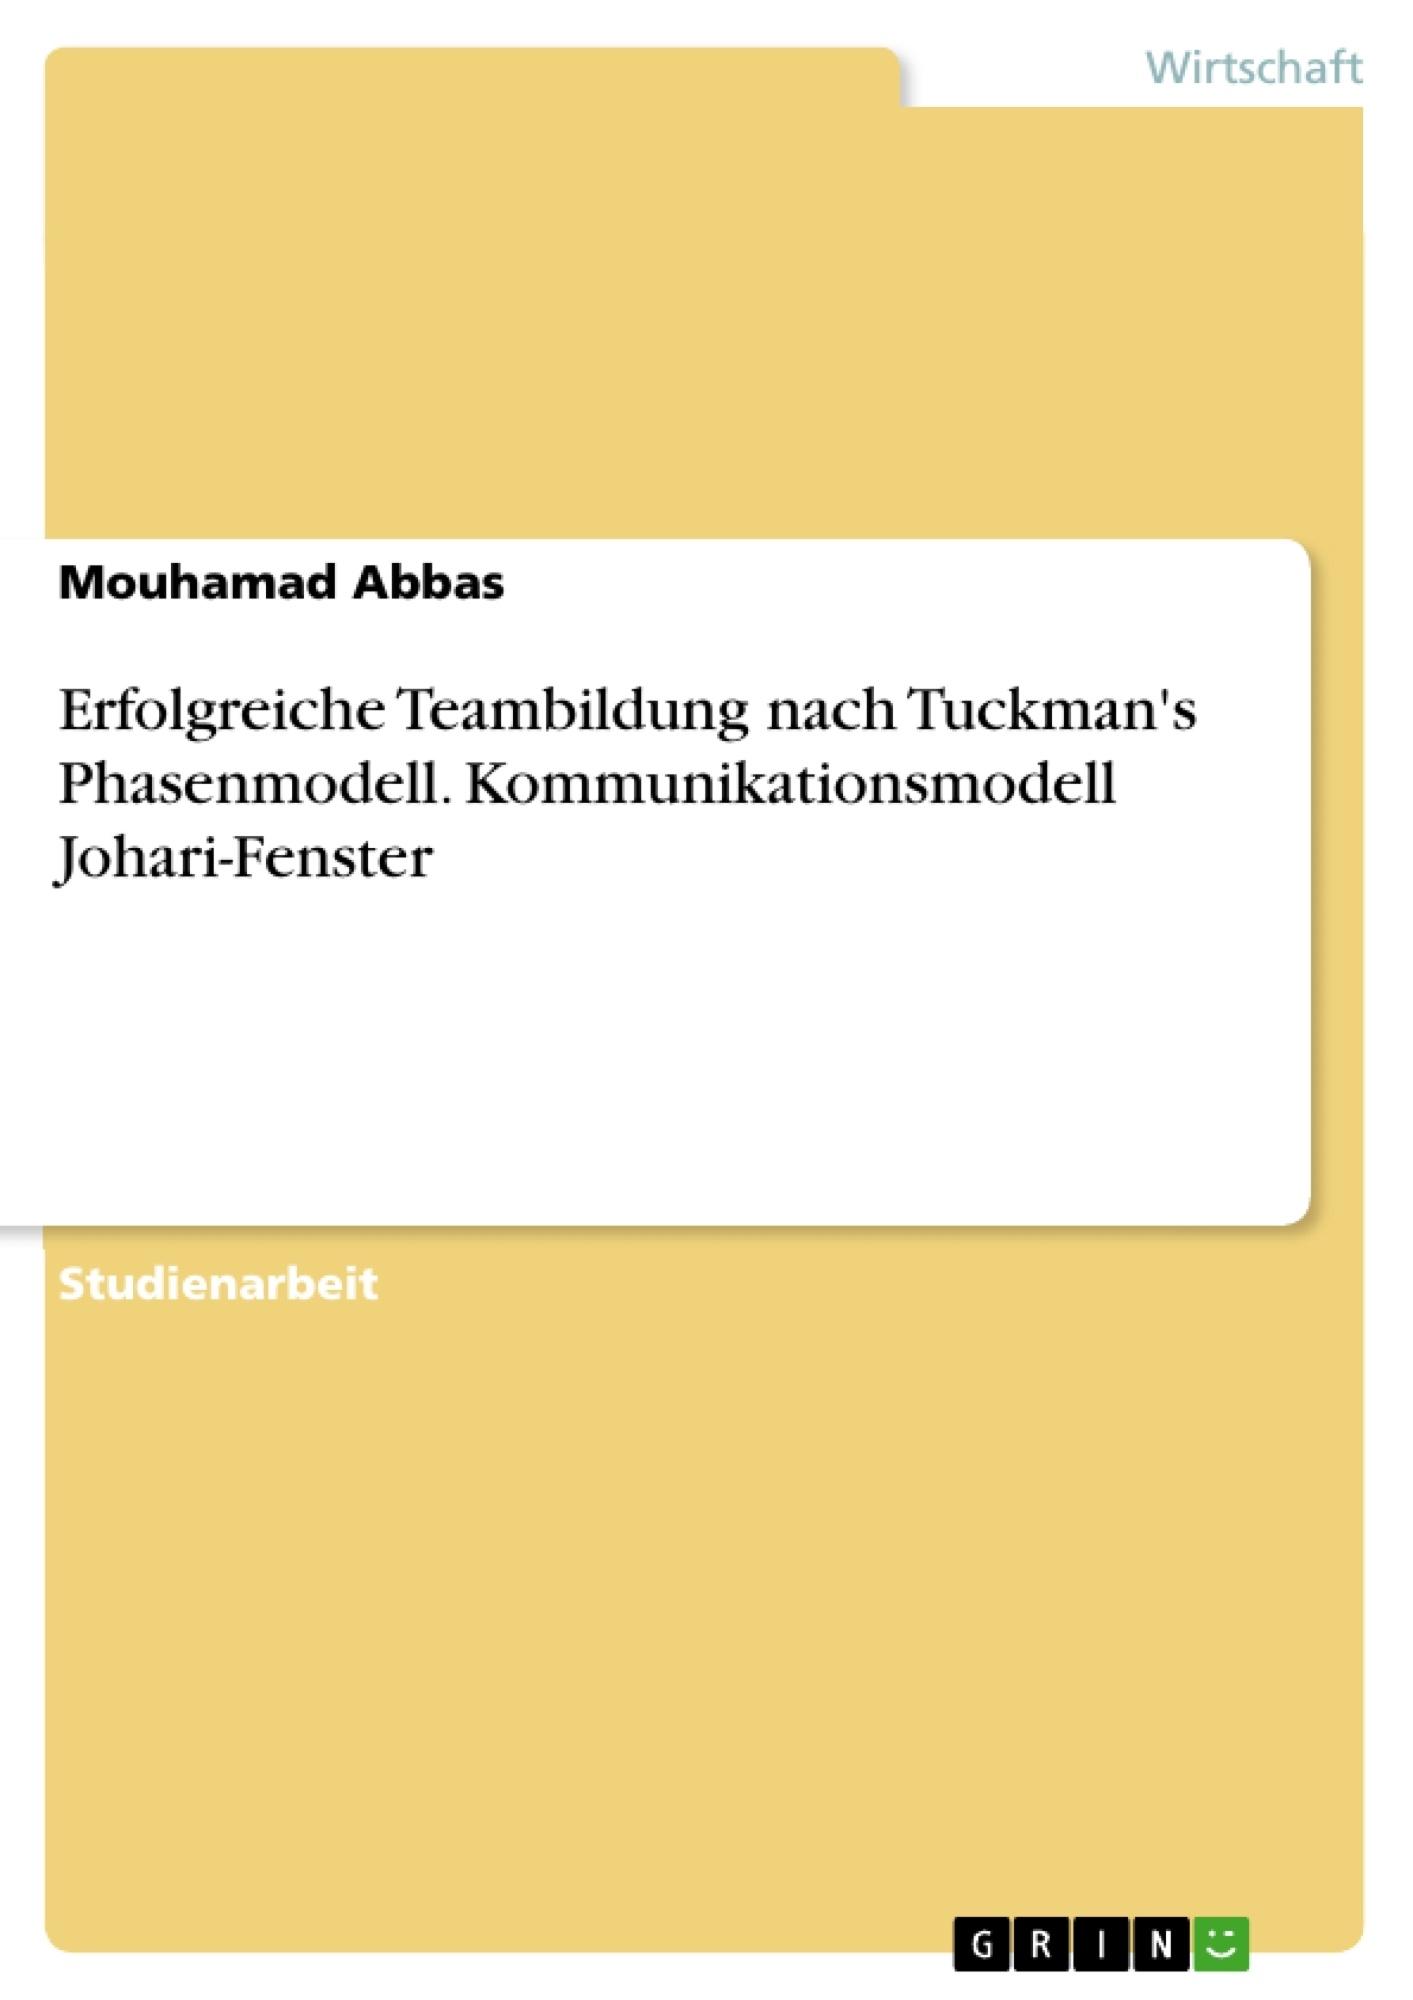 Titel: Erfolgreiche Teambildung nach Tuckman's Phasenmodell. Kommunikationsmodell Johari-Fenster